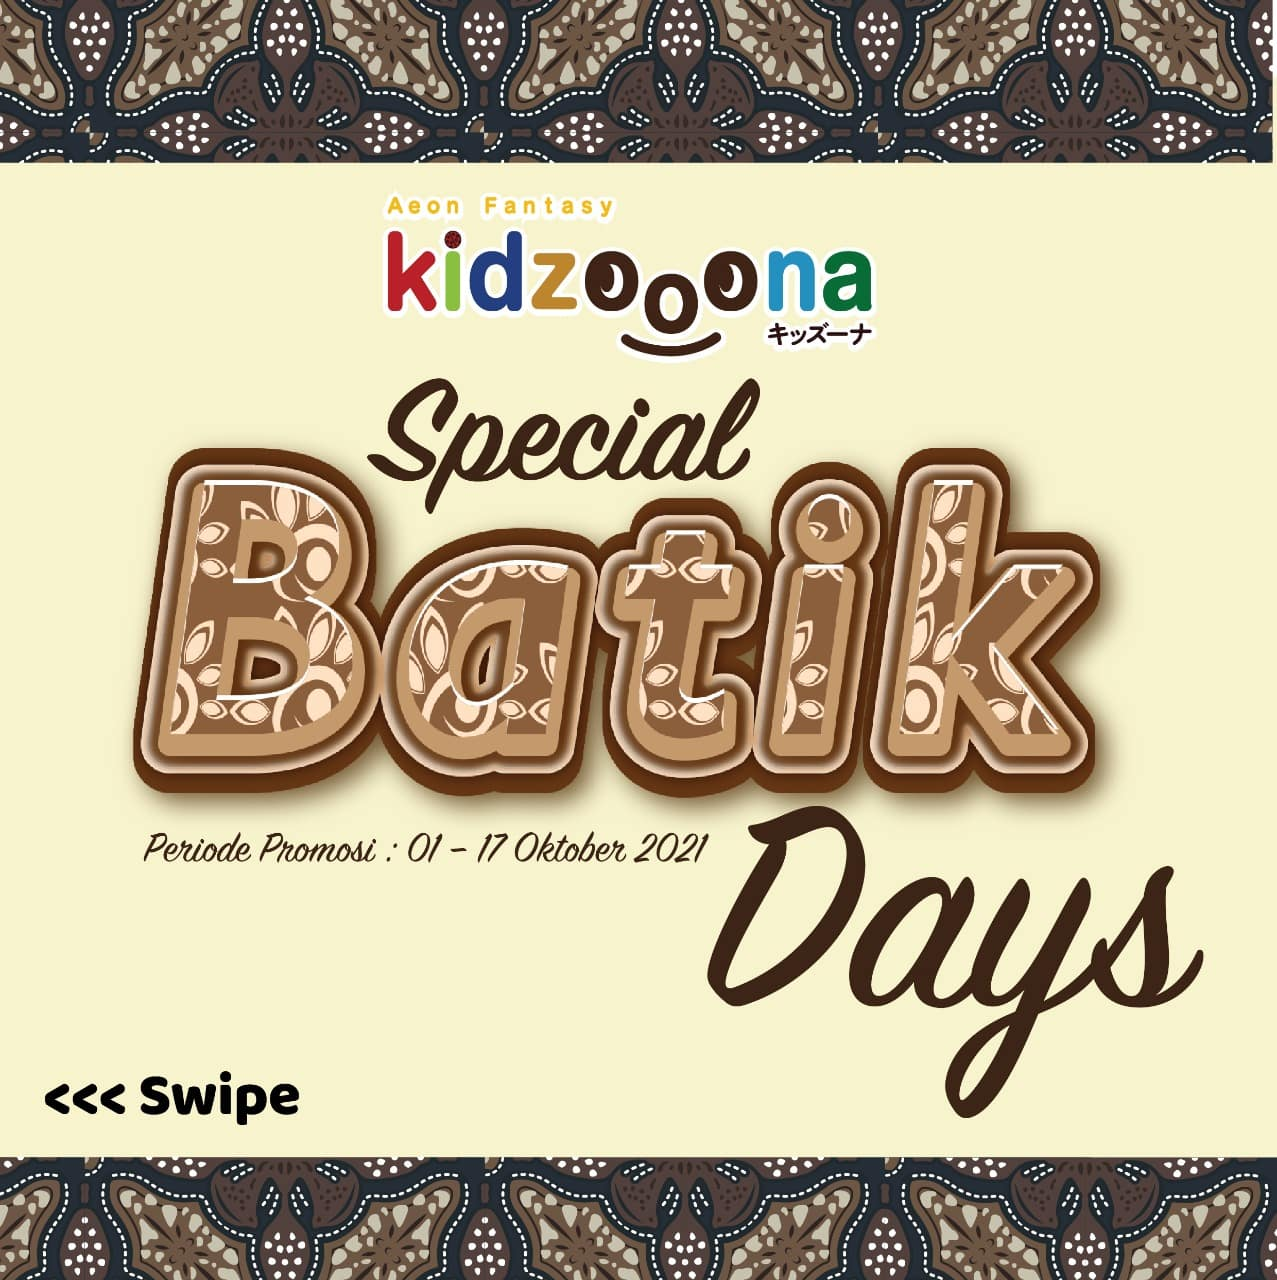 Special Batik Days